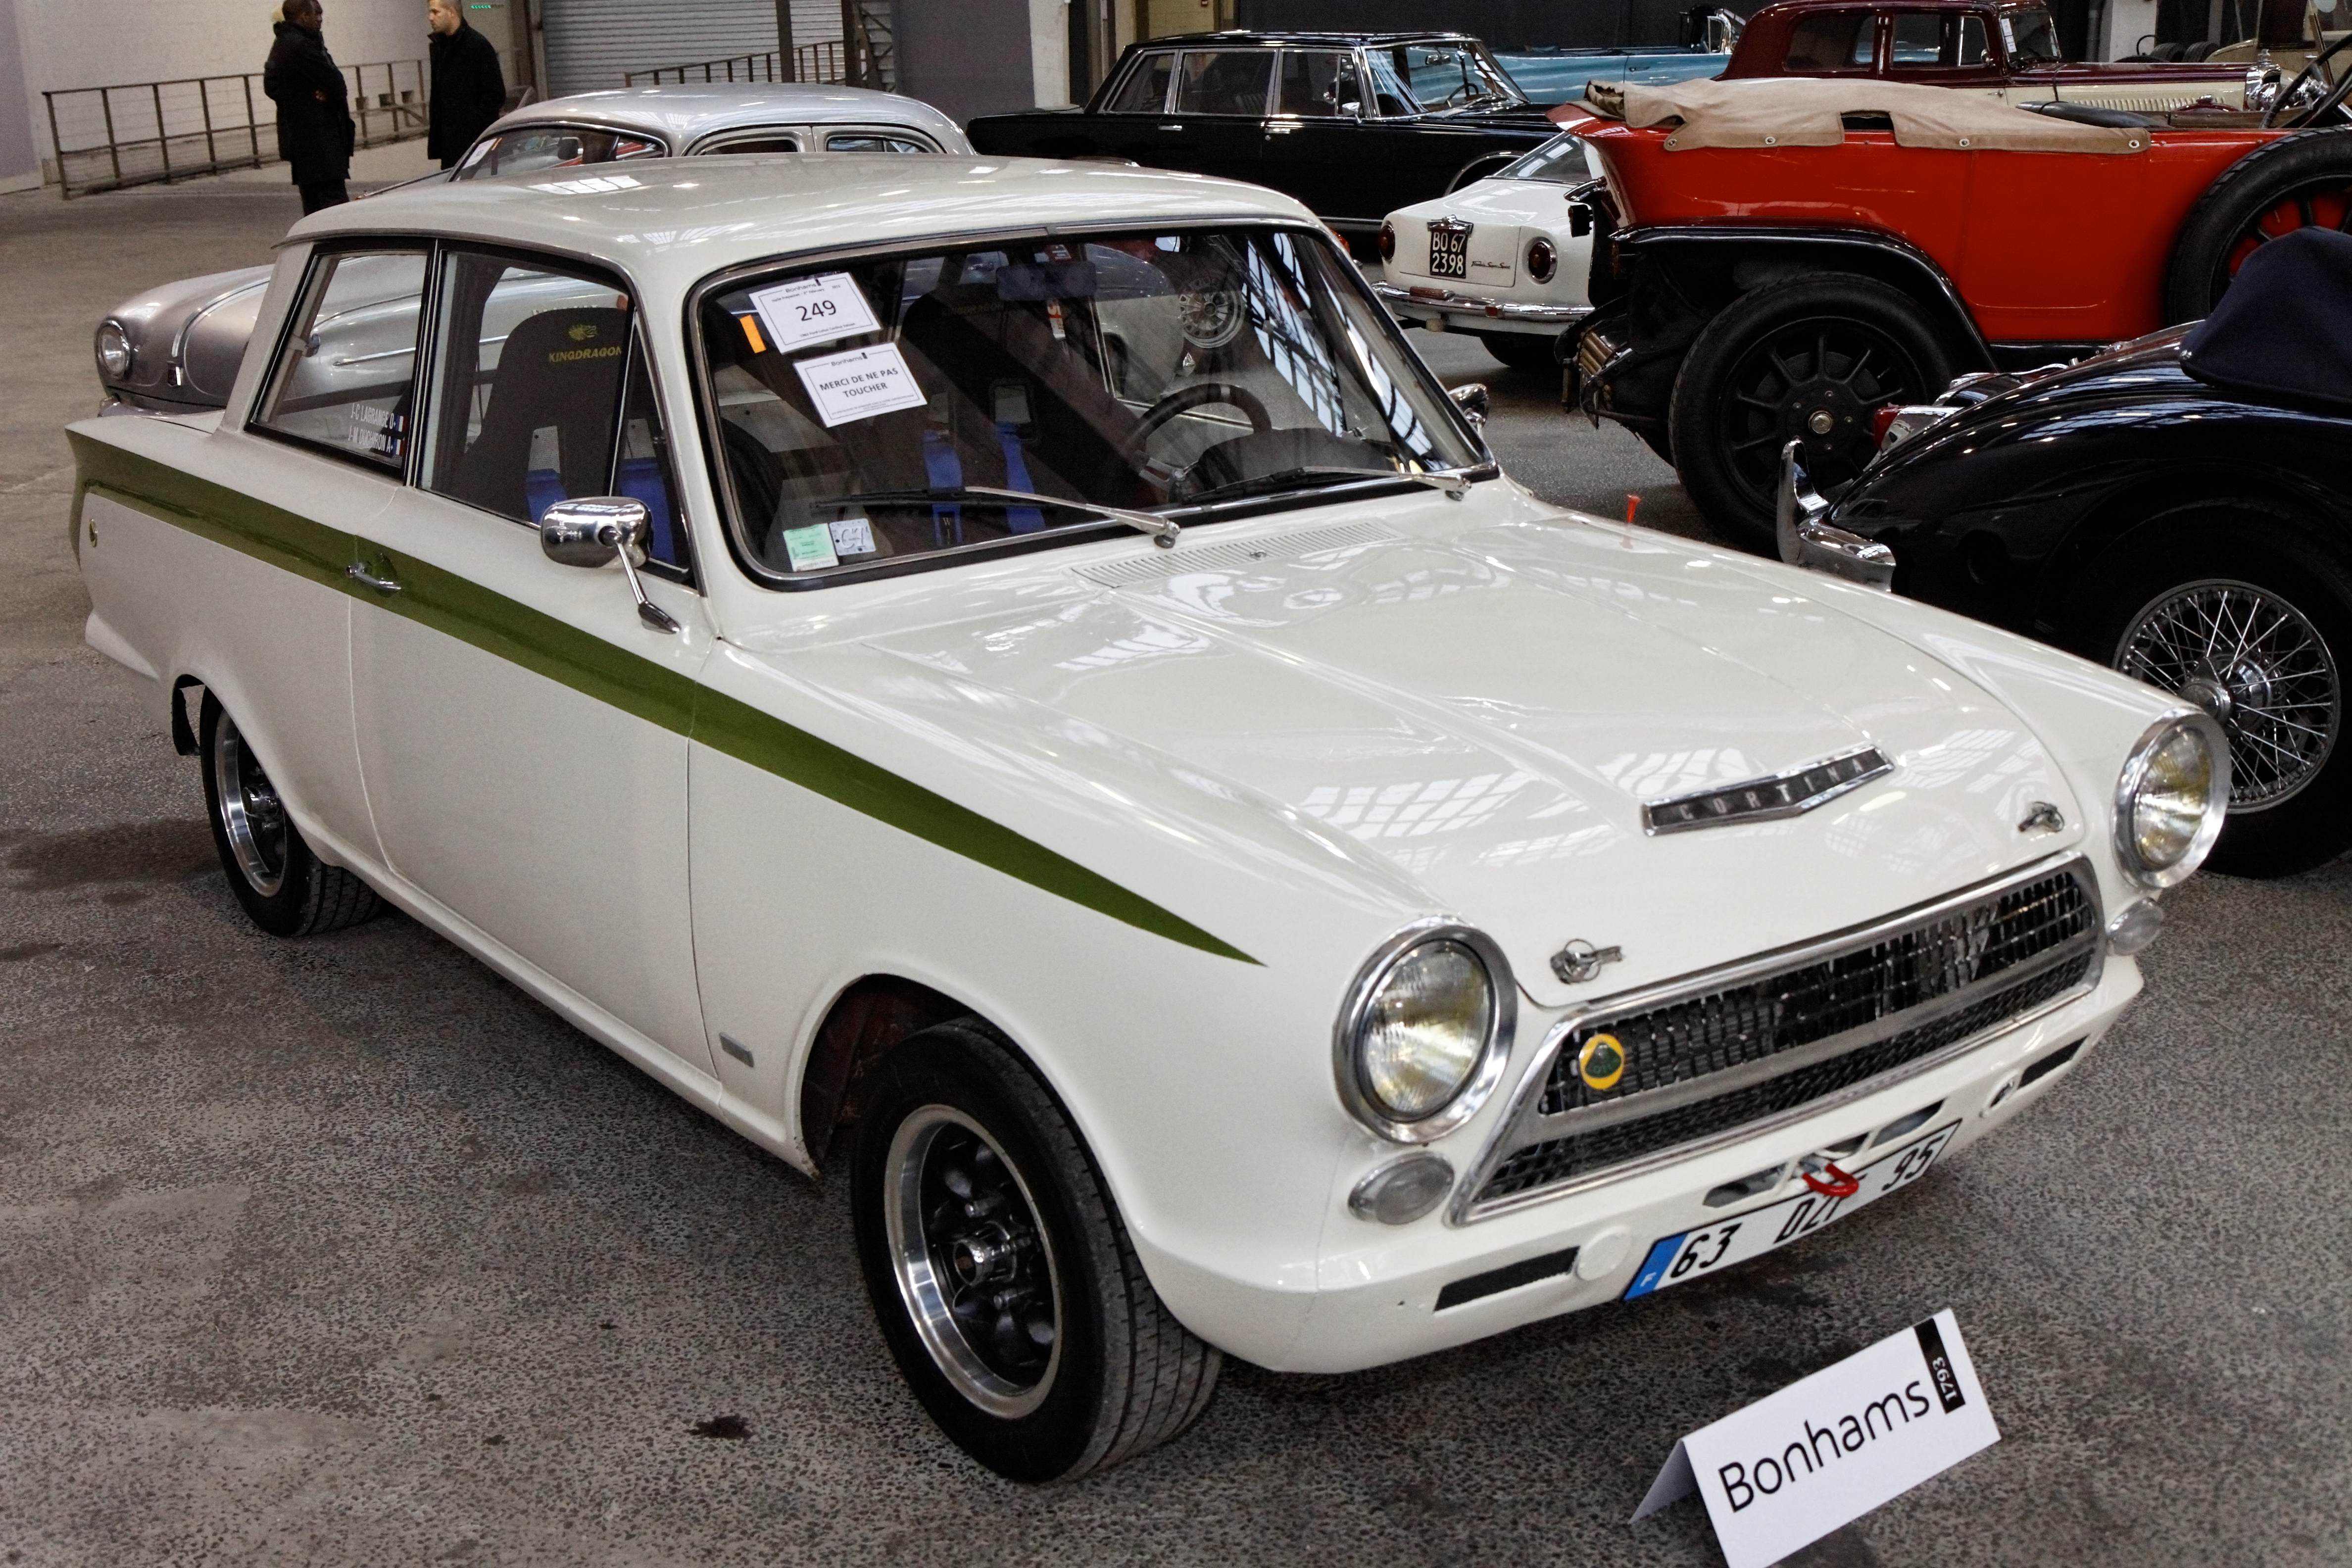 File:Bonhams - The Paris Sale 2012 - Ford Lotus Cortina Saloon ...